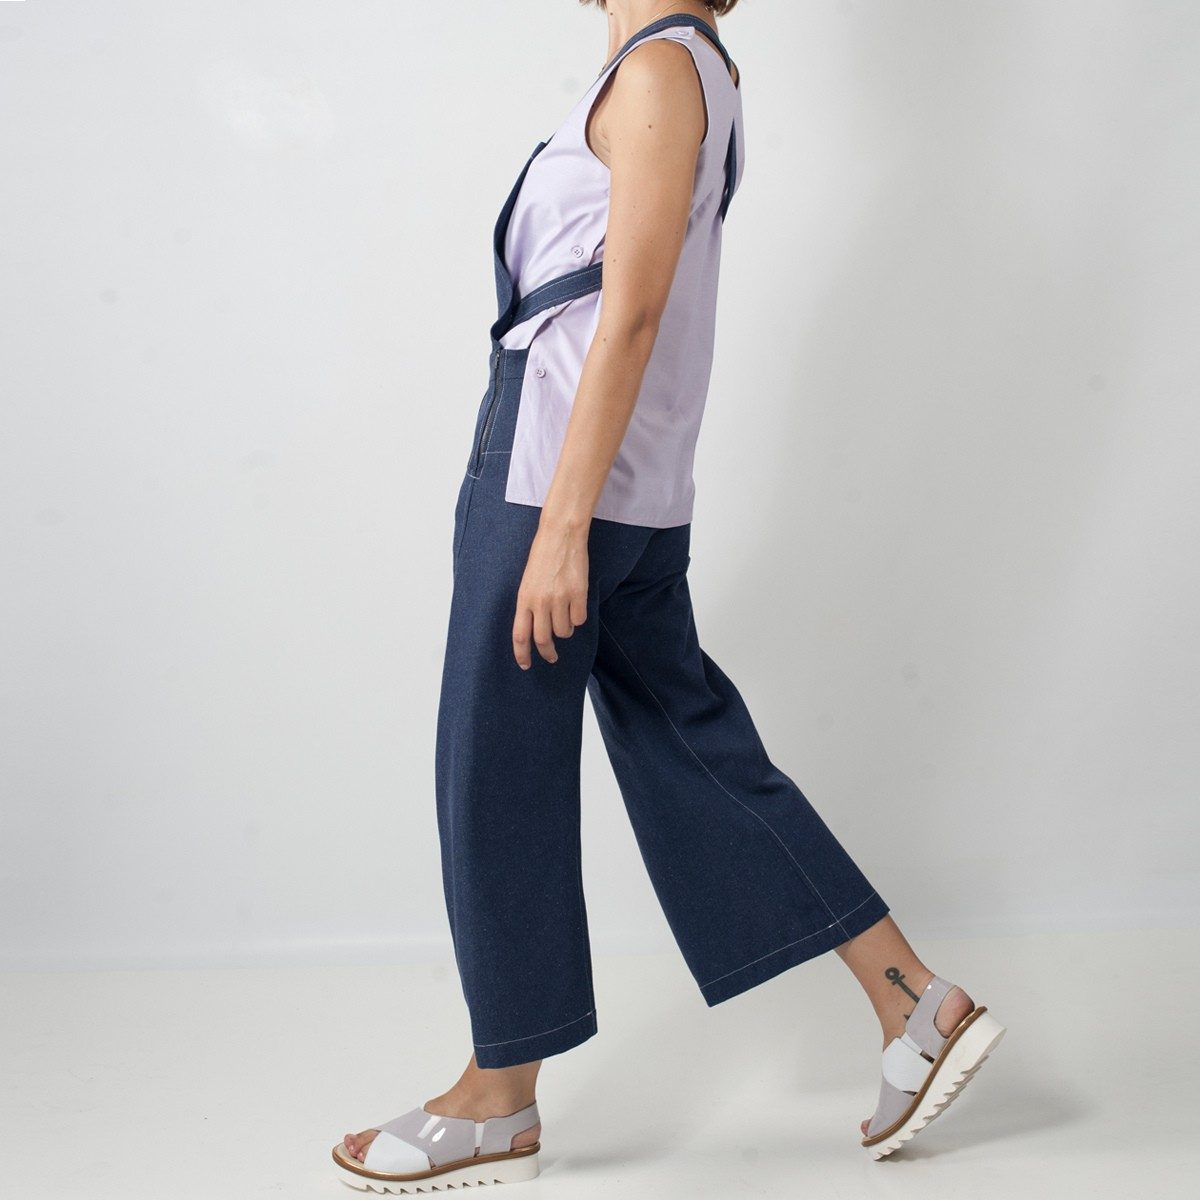 WYLDE - salopette jeans cote